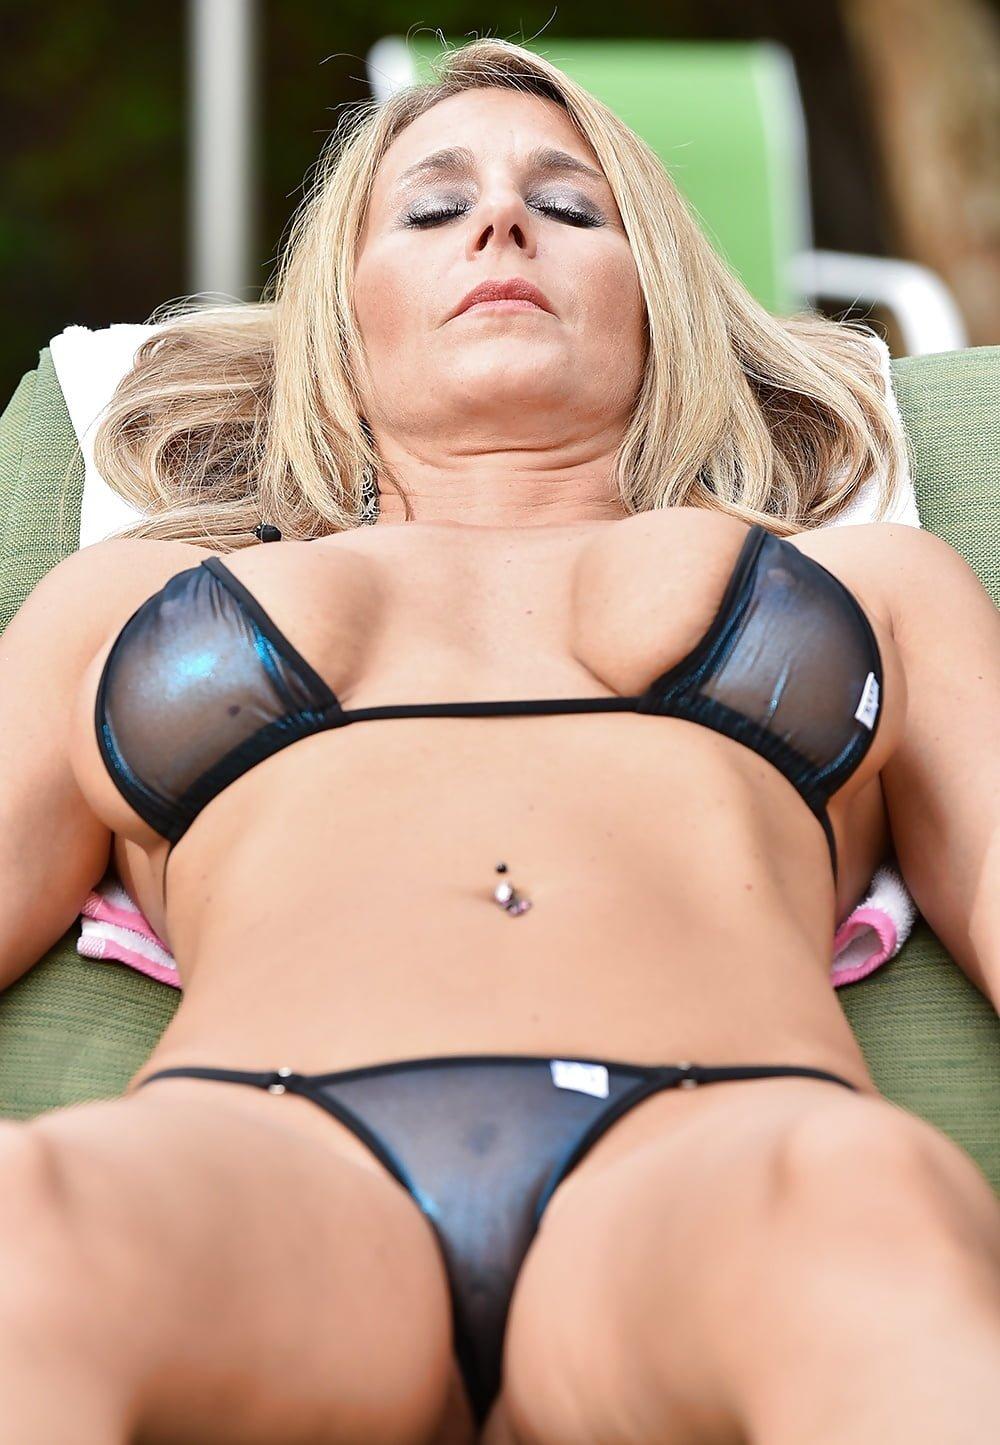 Aruba beach bikini milf sexy wife free porn galery, hot sex pics